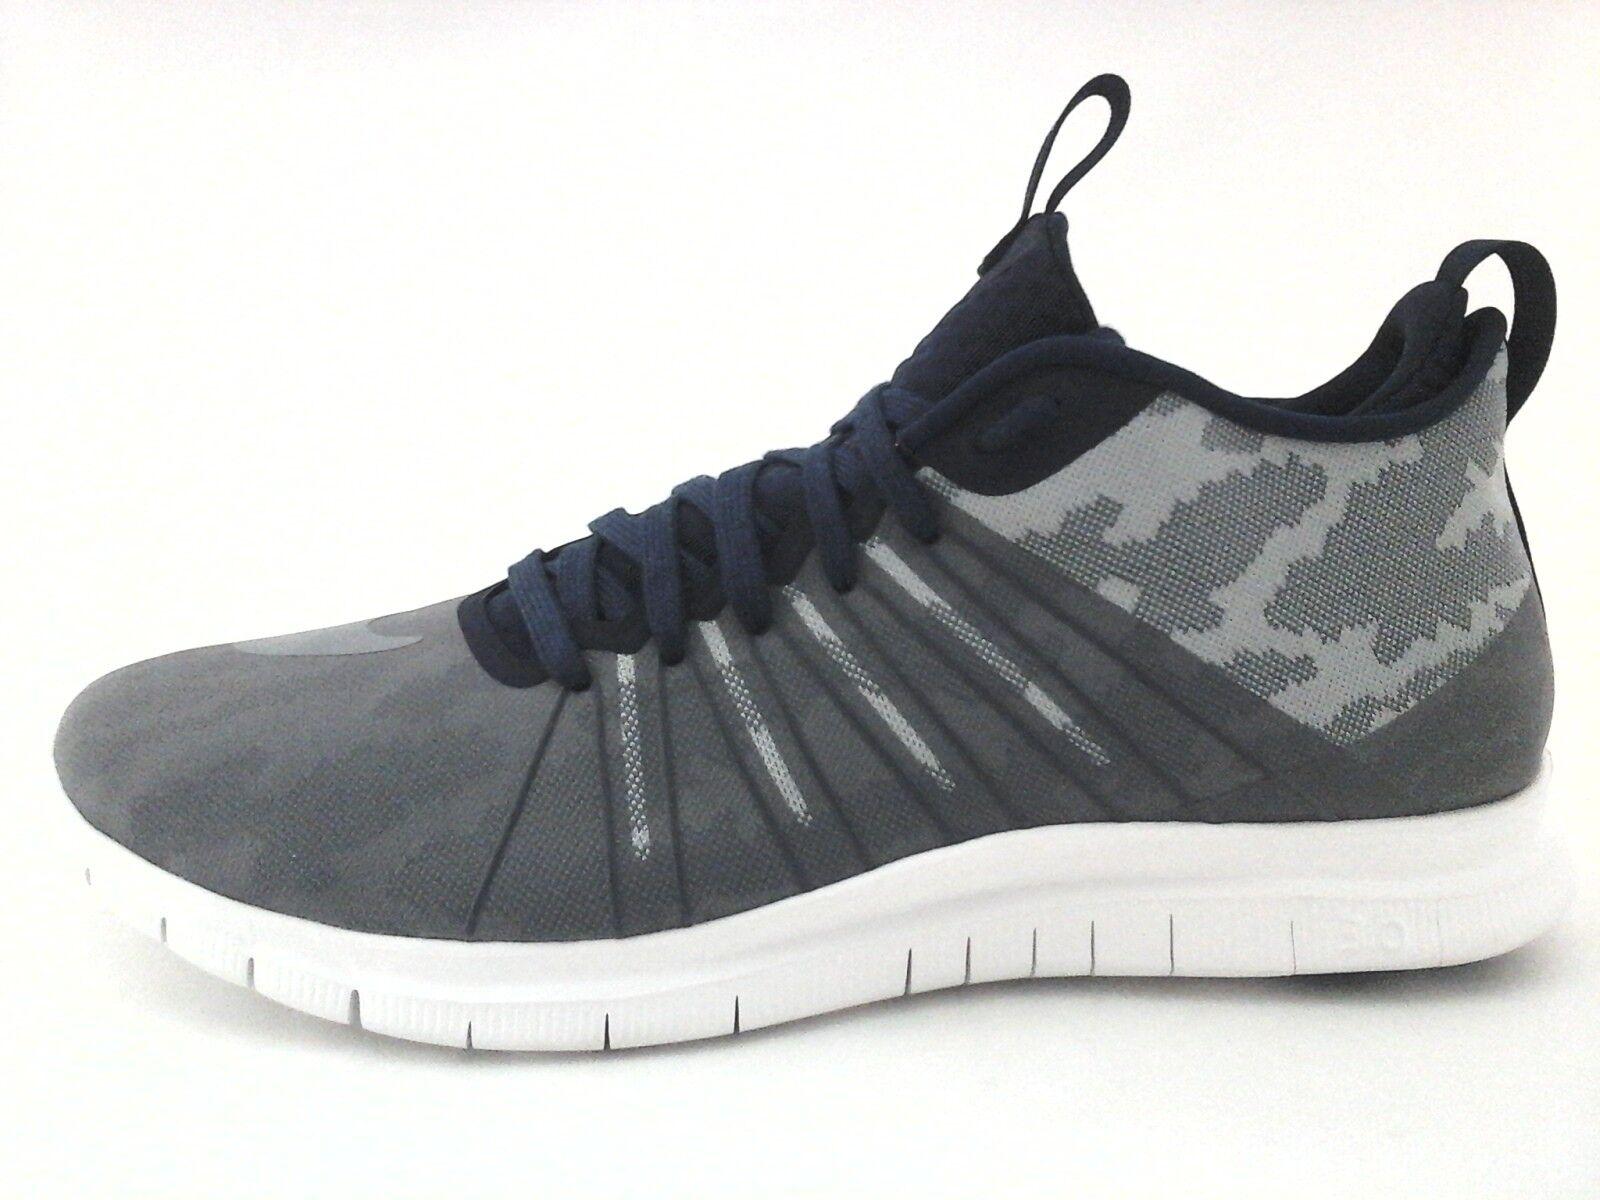 Nike F.C. Hypervenom 2 Free 3.0 747140-003 Men's Training shoes US 12 New